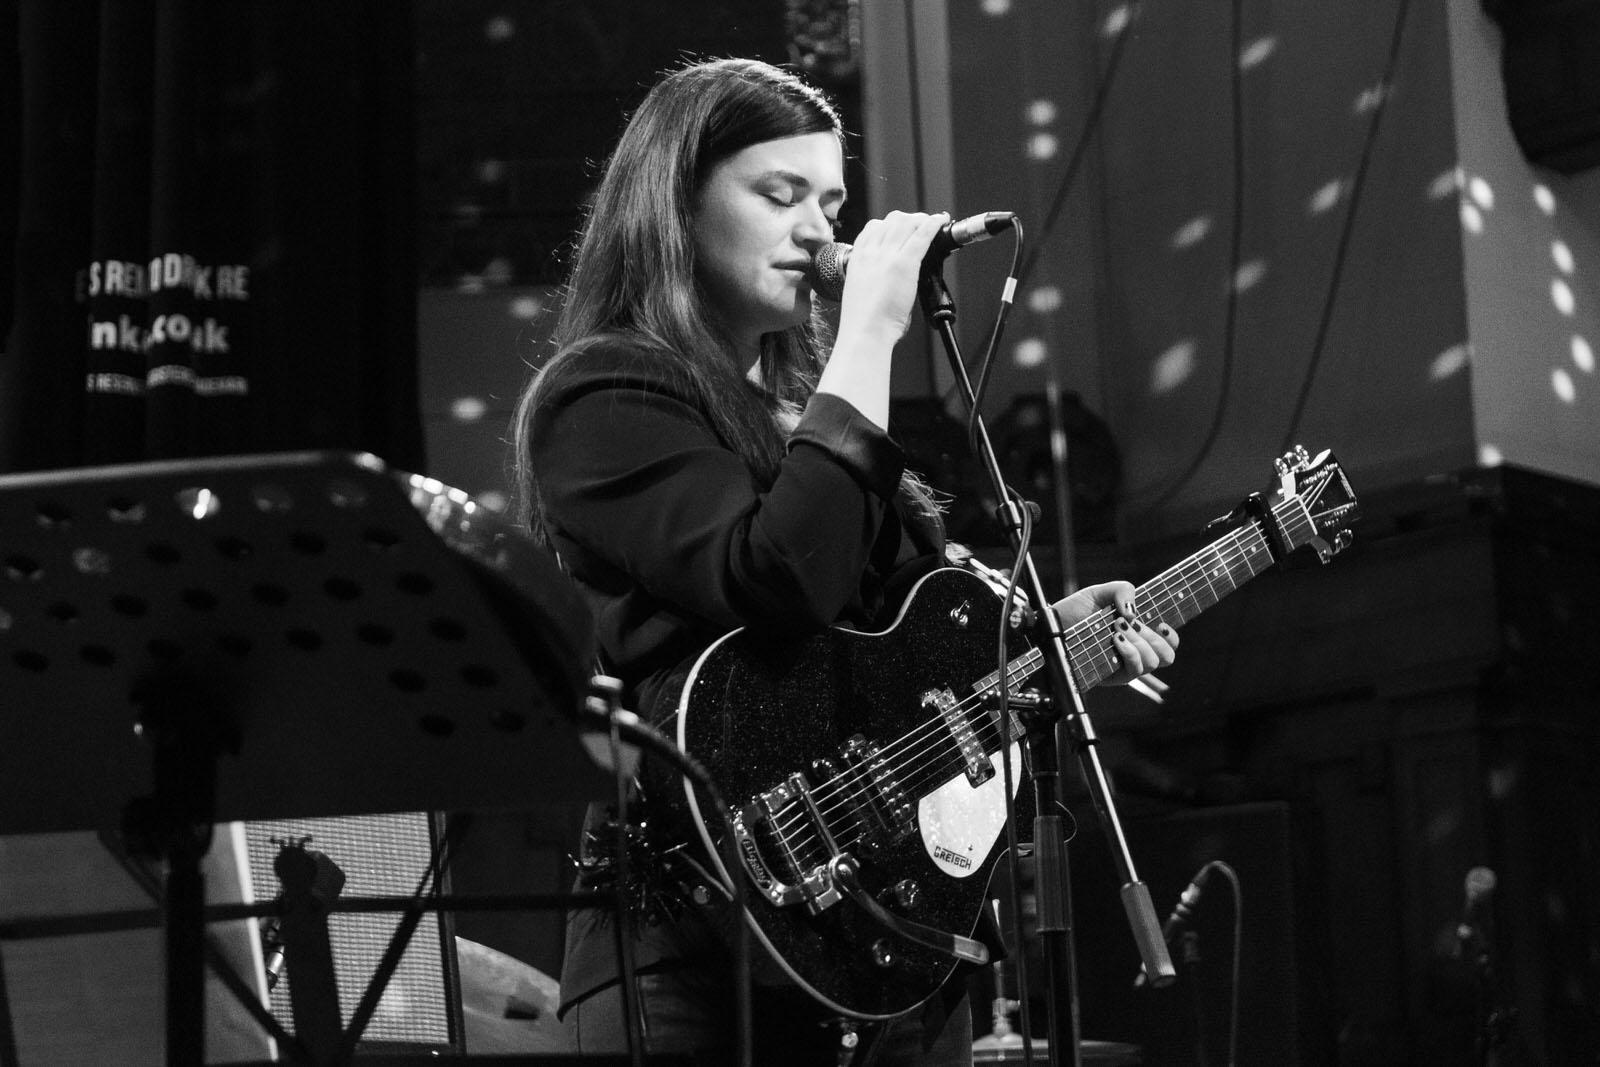 Photo of Siobhan Wilson on stage at Saint Luke's on 3 February 2019